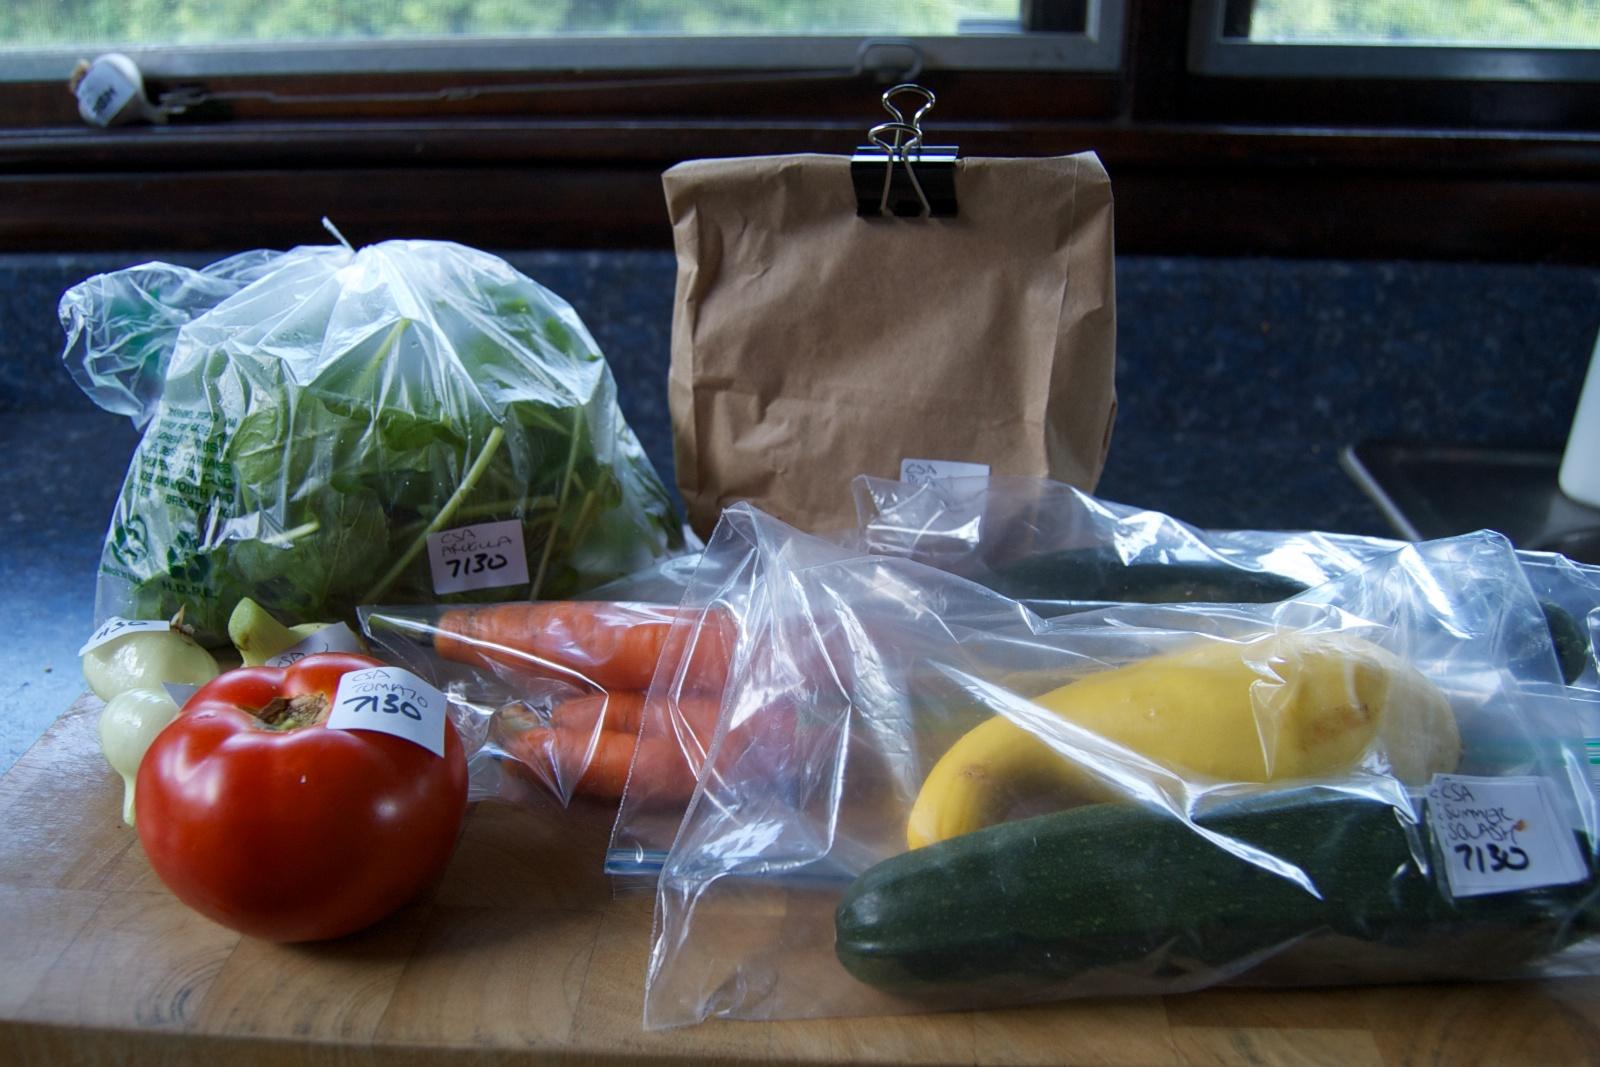 http://blog.rickk.com/food/2014/07/30/csa.2014.08.3.jpg